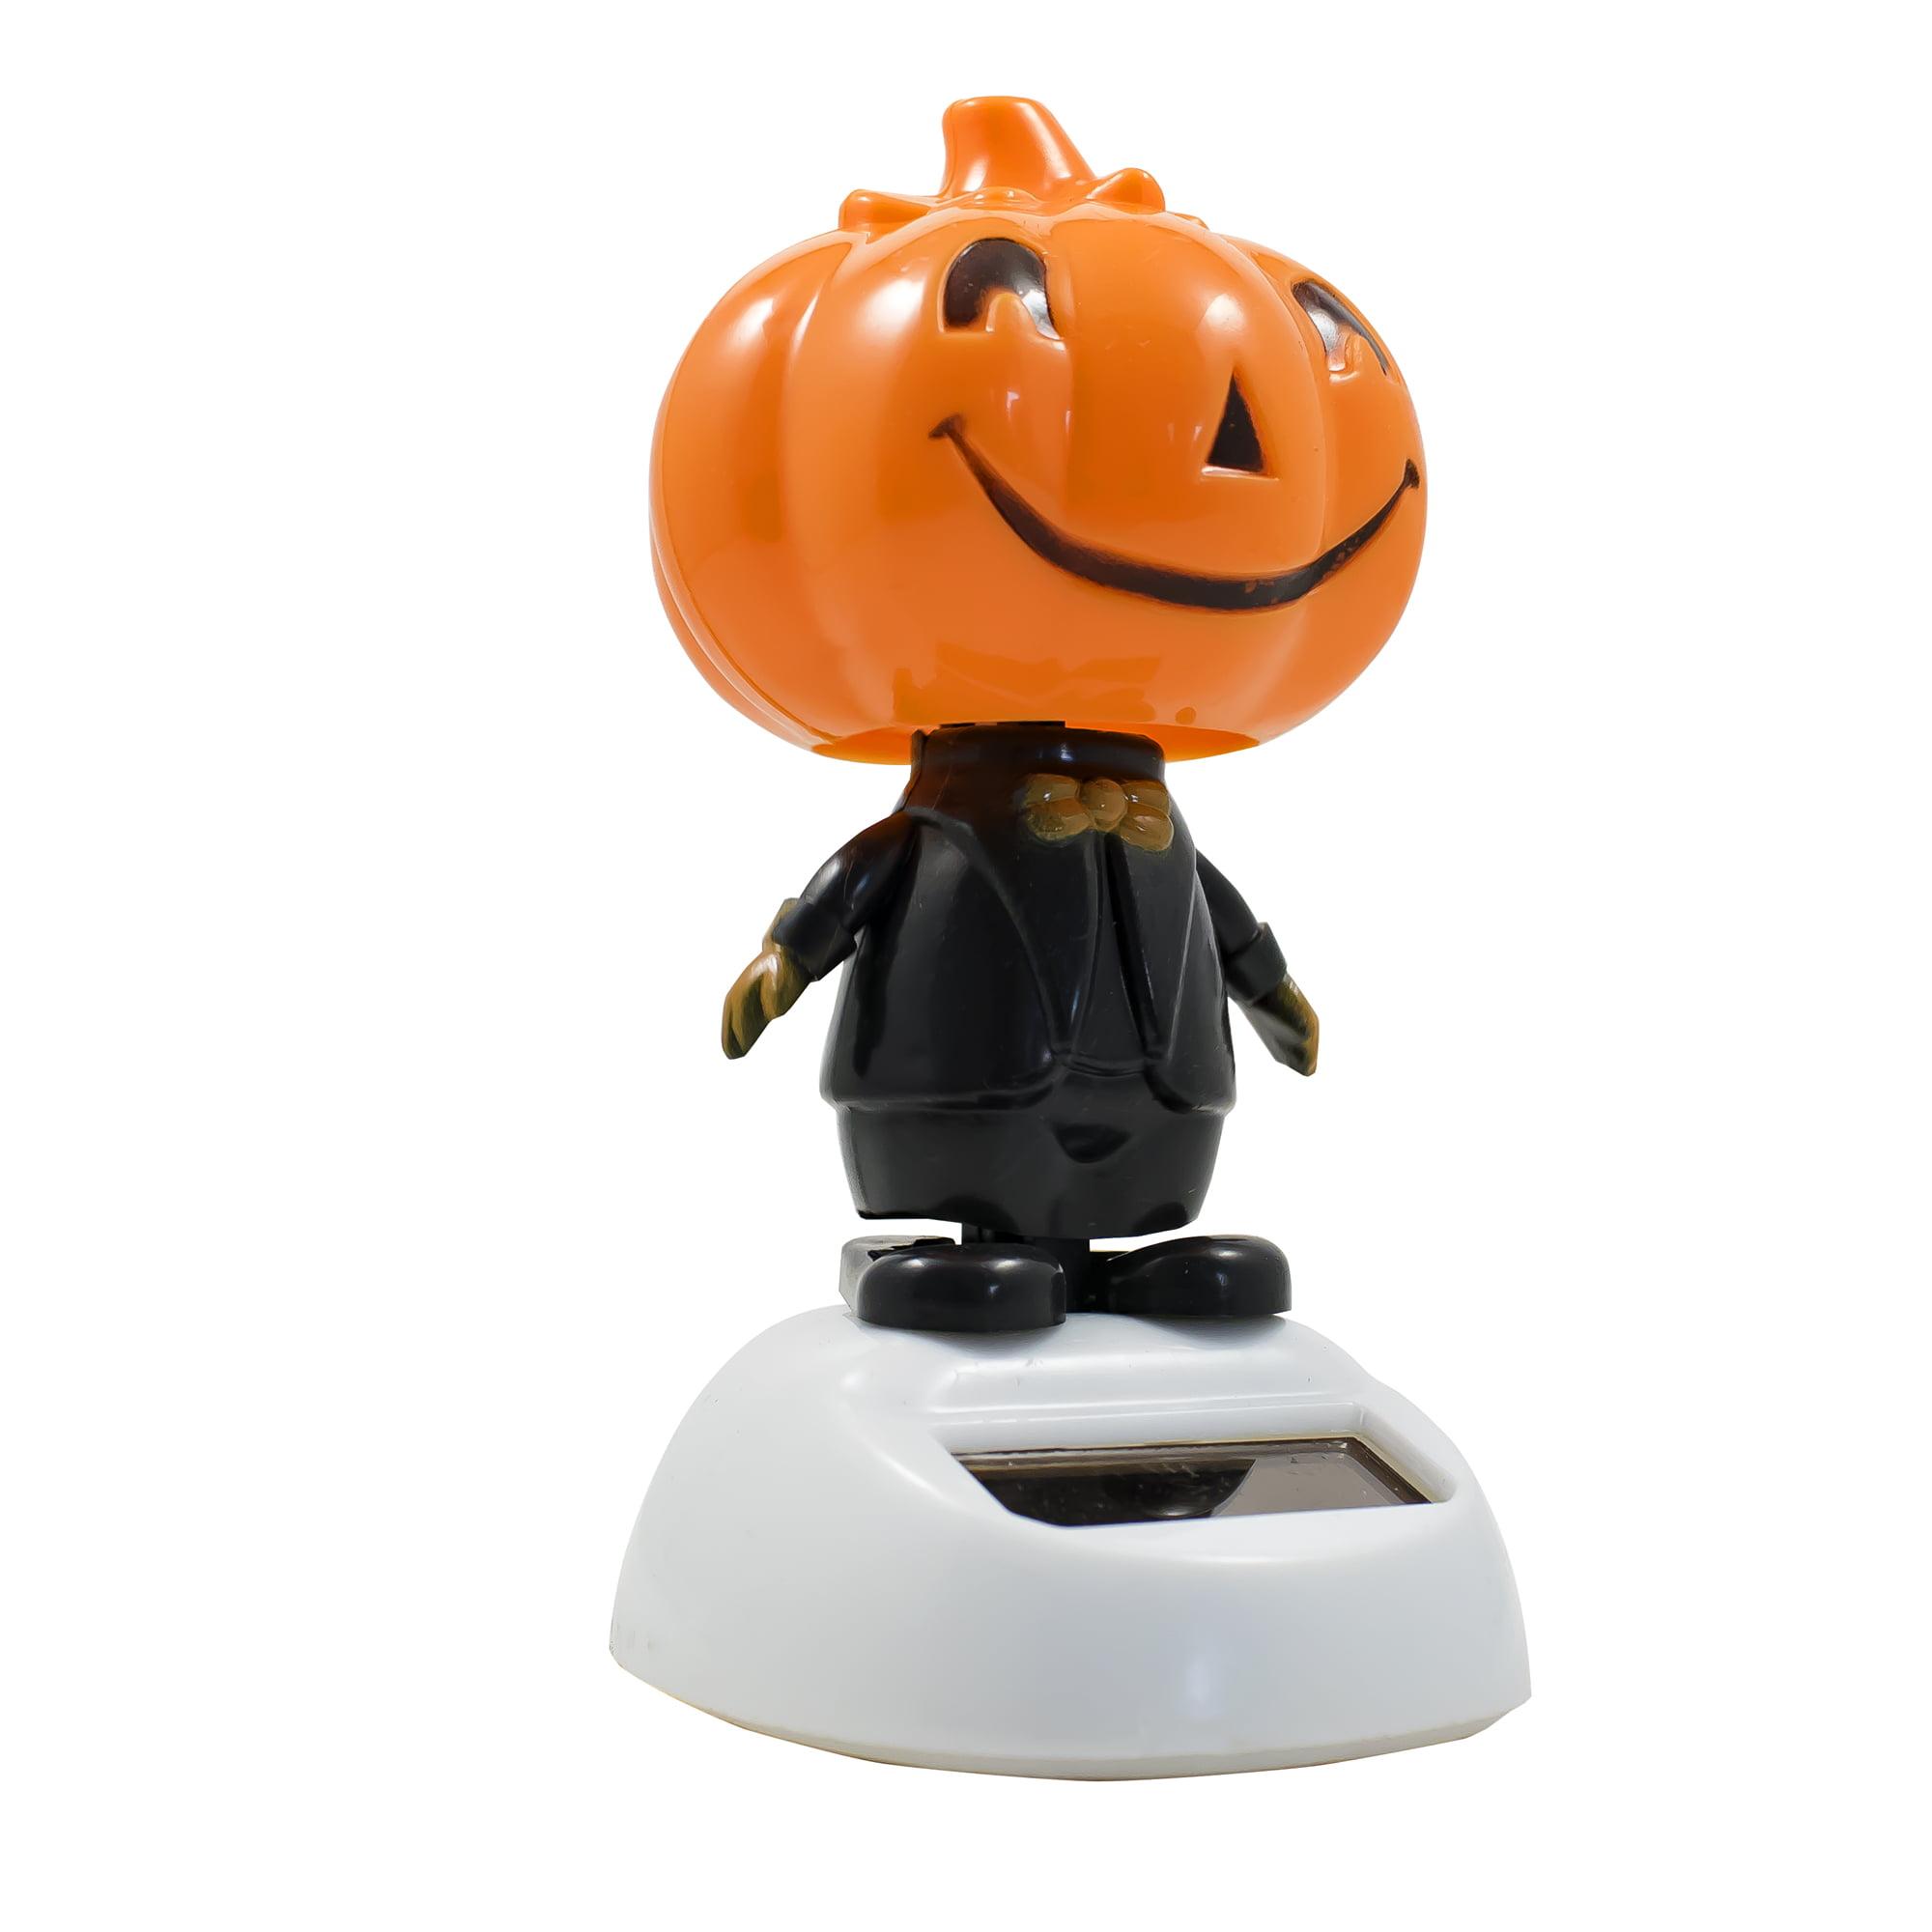 Halloween Solar Power Motion Toy Figurine Light Activated Car Office Home Decor Cute Novelty Gift Suncatcher Smile Pumpkin